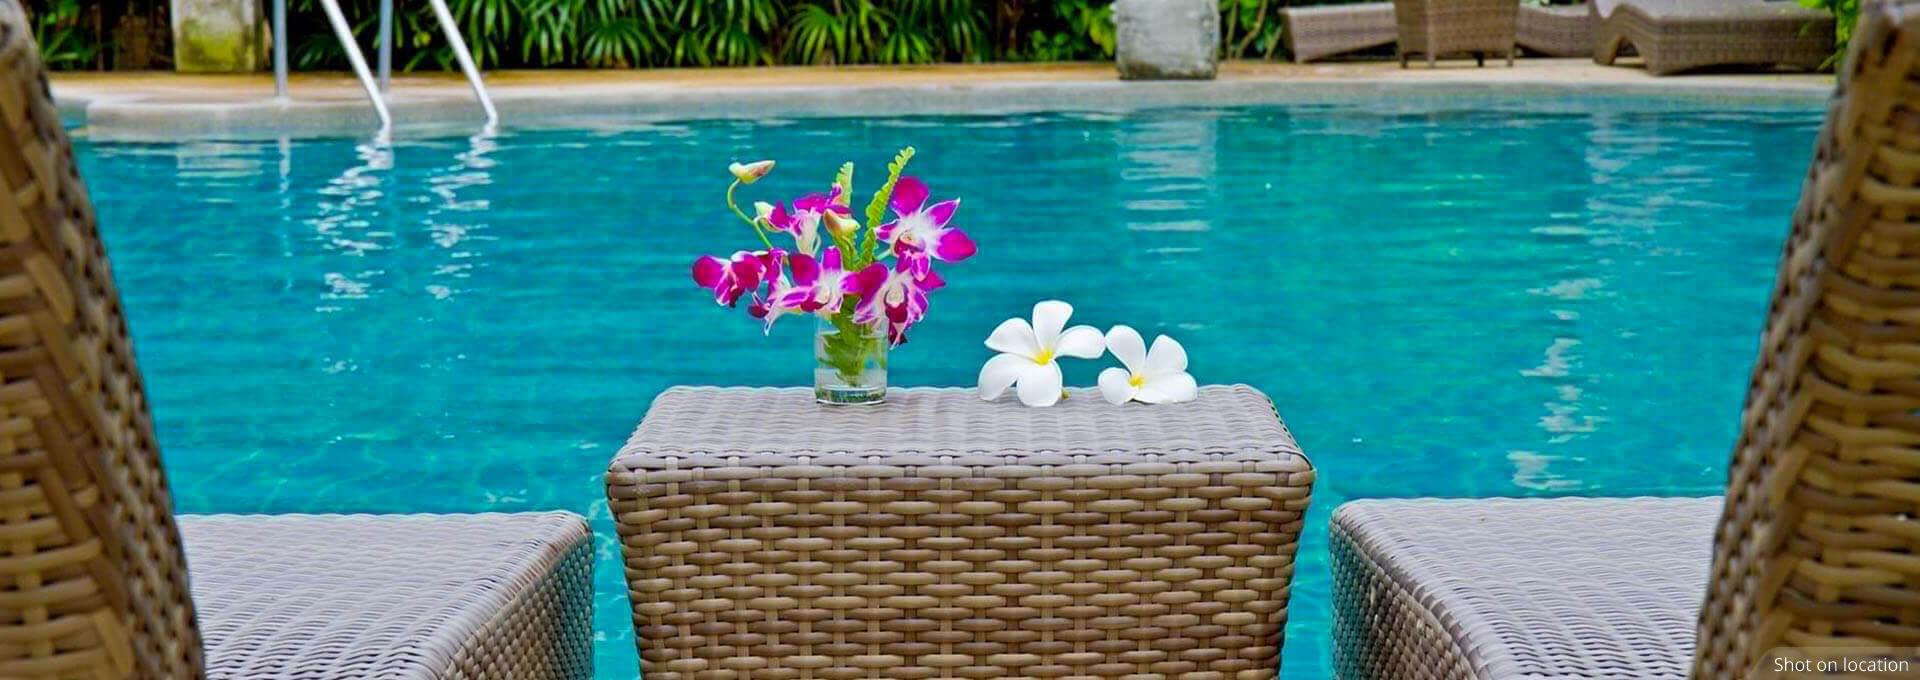 Swimming Pool near Villas by House of Hiranandani in Devanahalli, Bengaluru